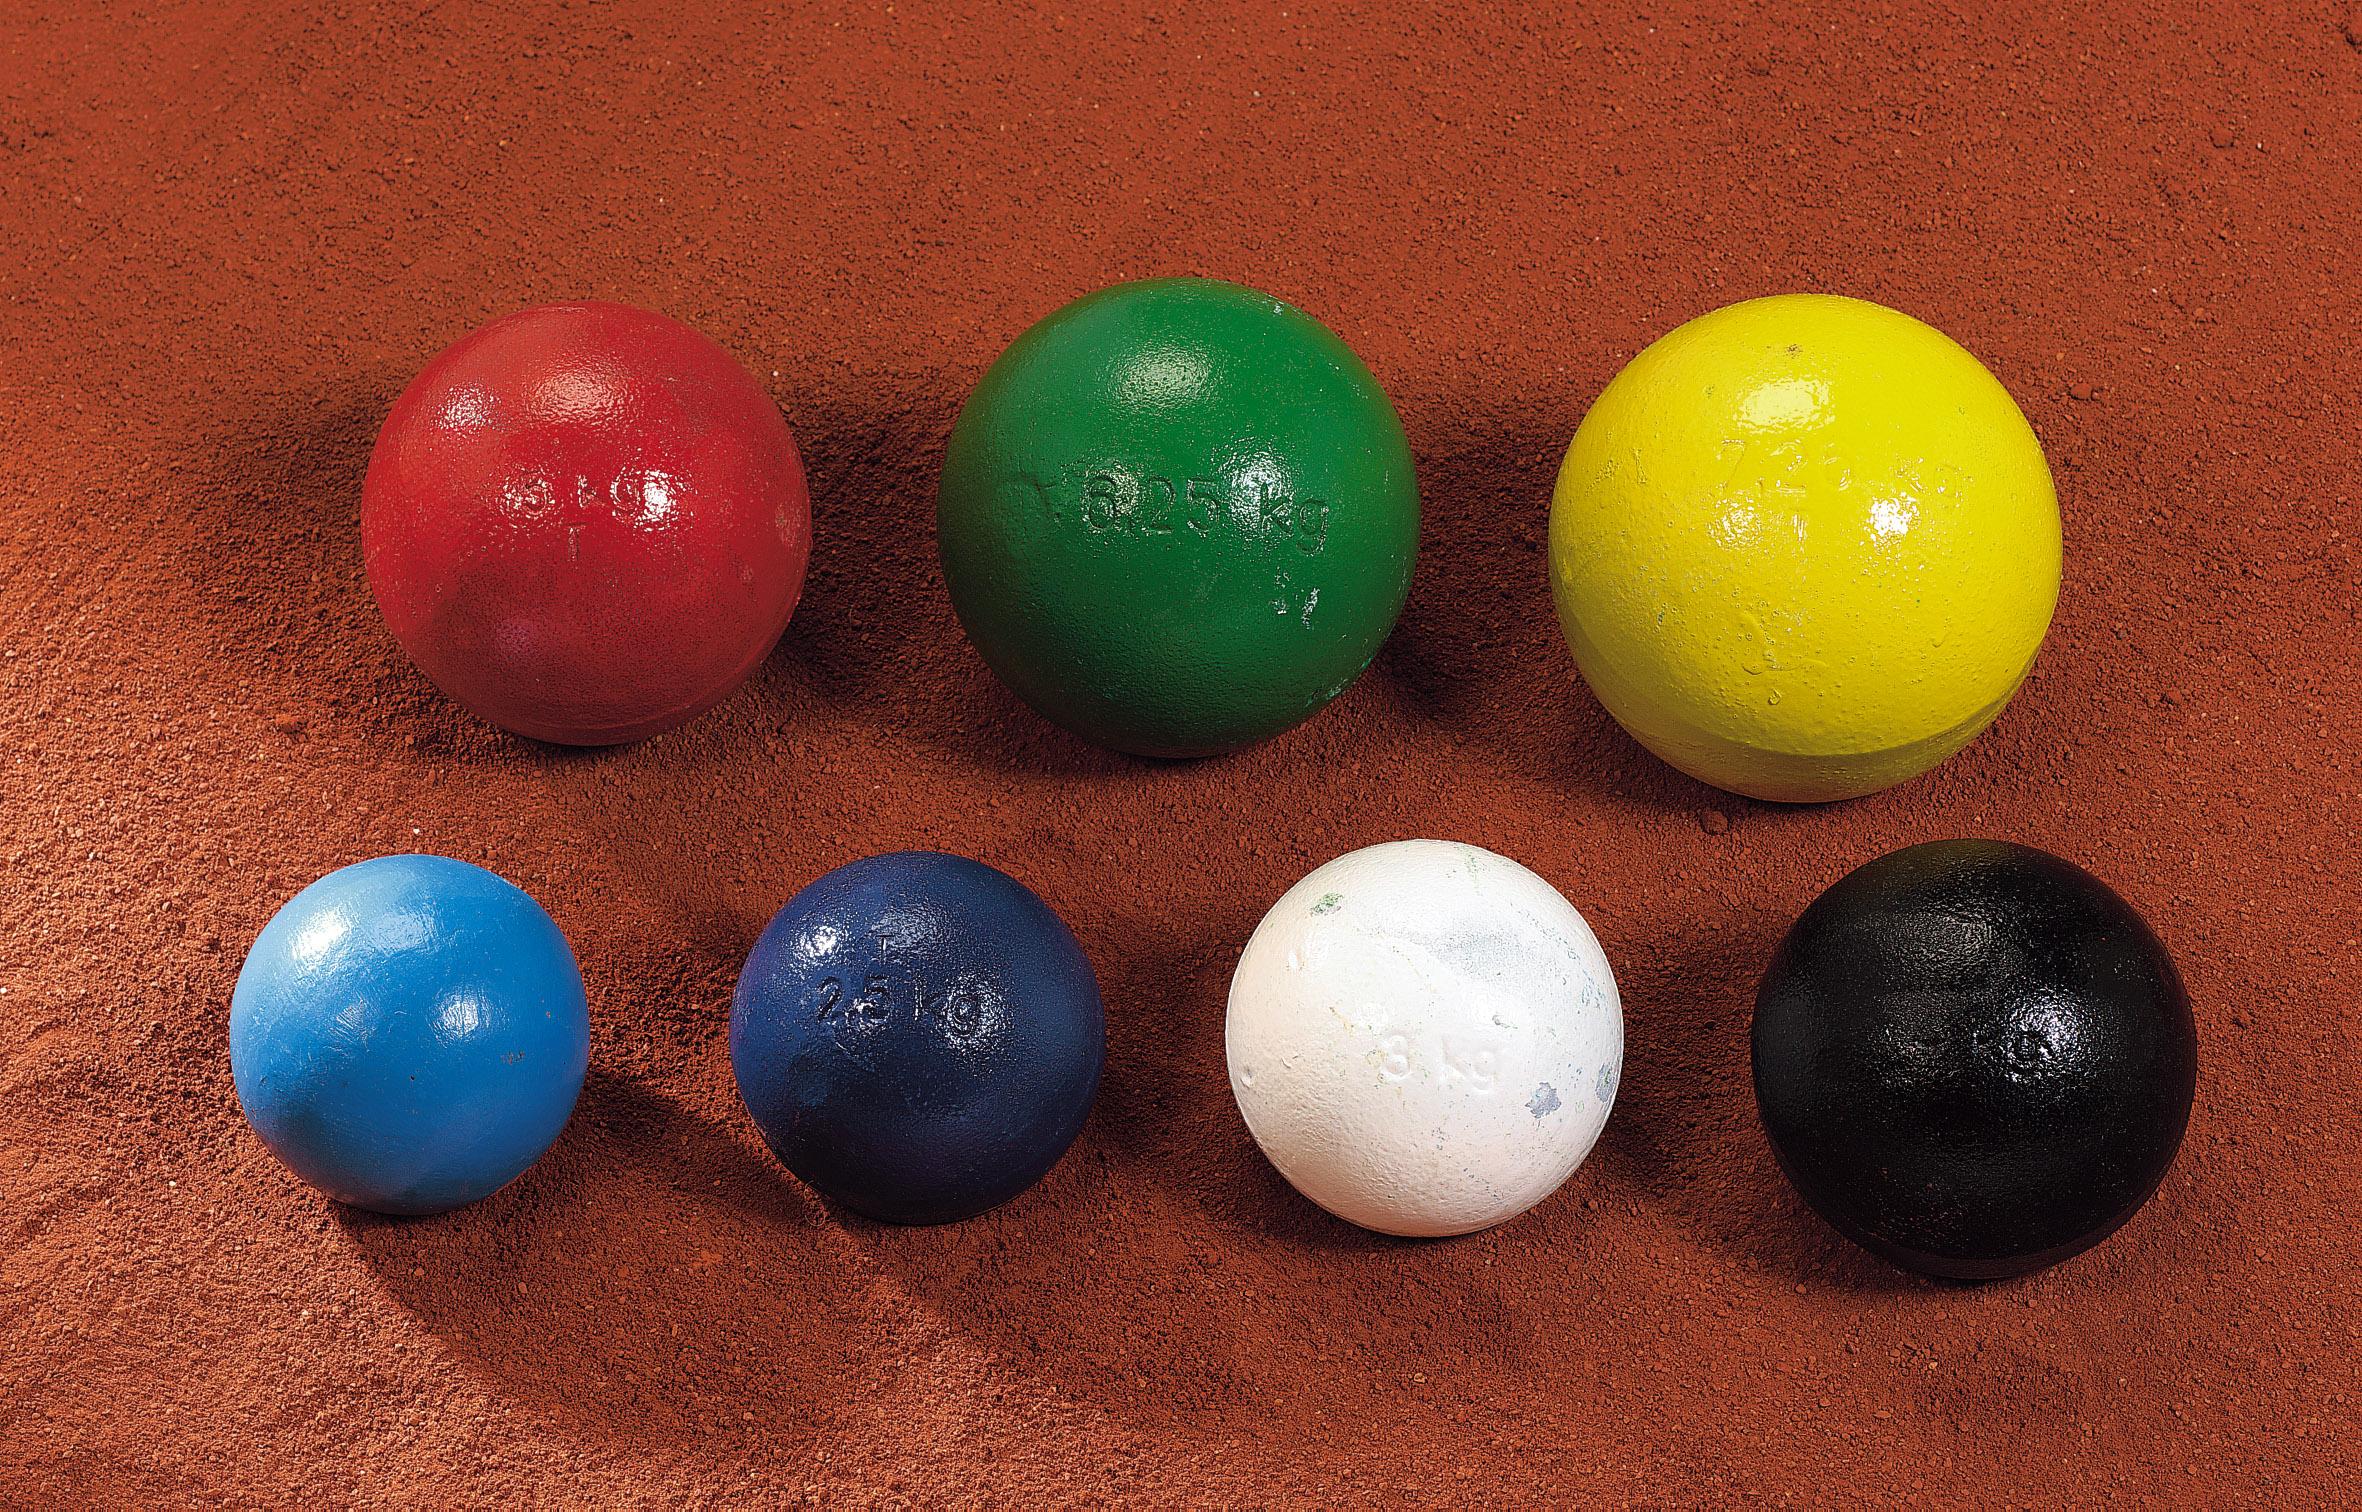 Trainings-Stoßkugel 2,5 kg d'blau